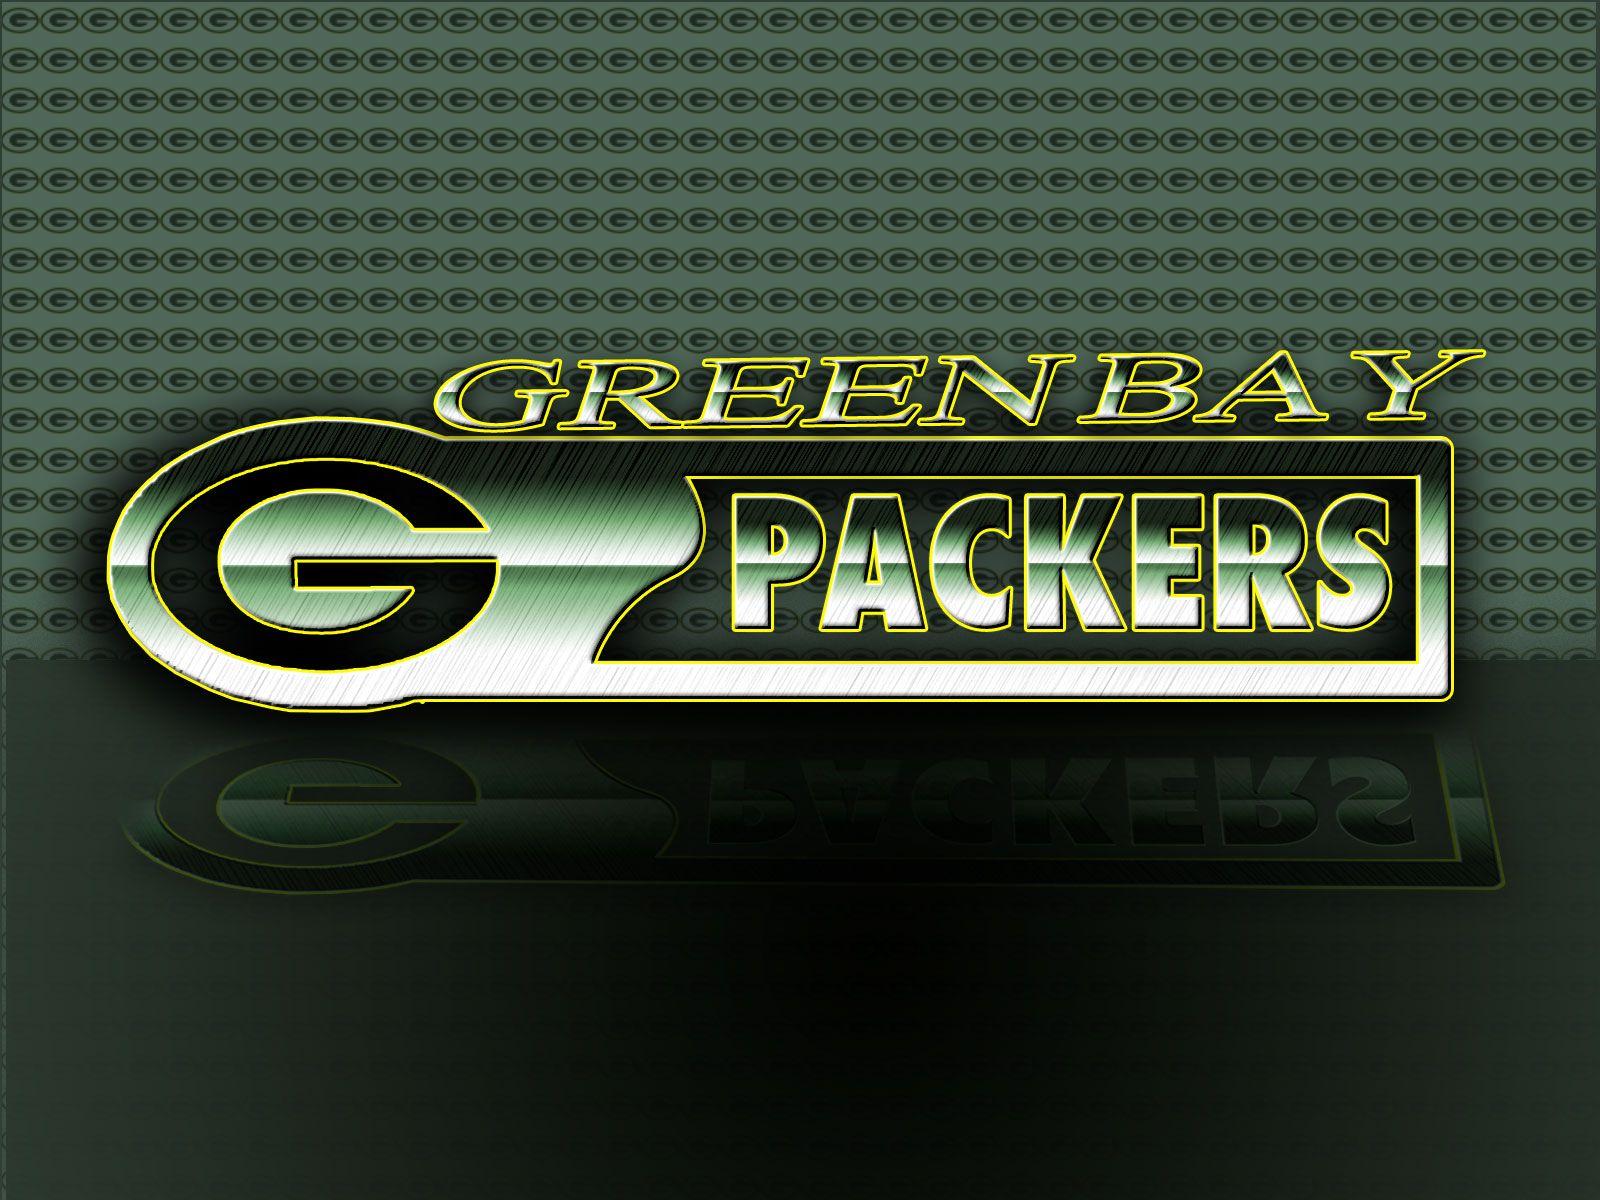 >packers wallpaper Green bay packers wallpaper, Green